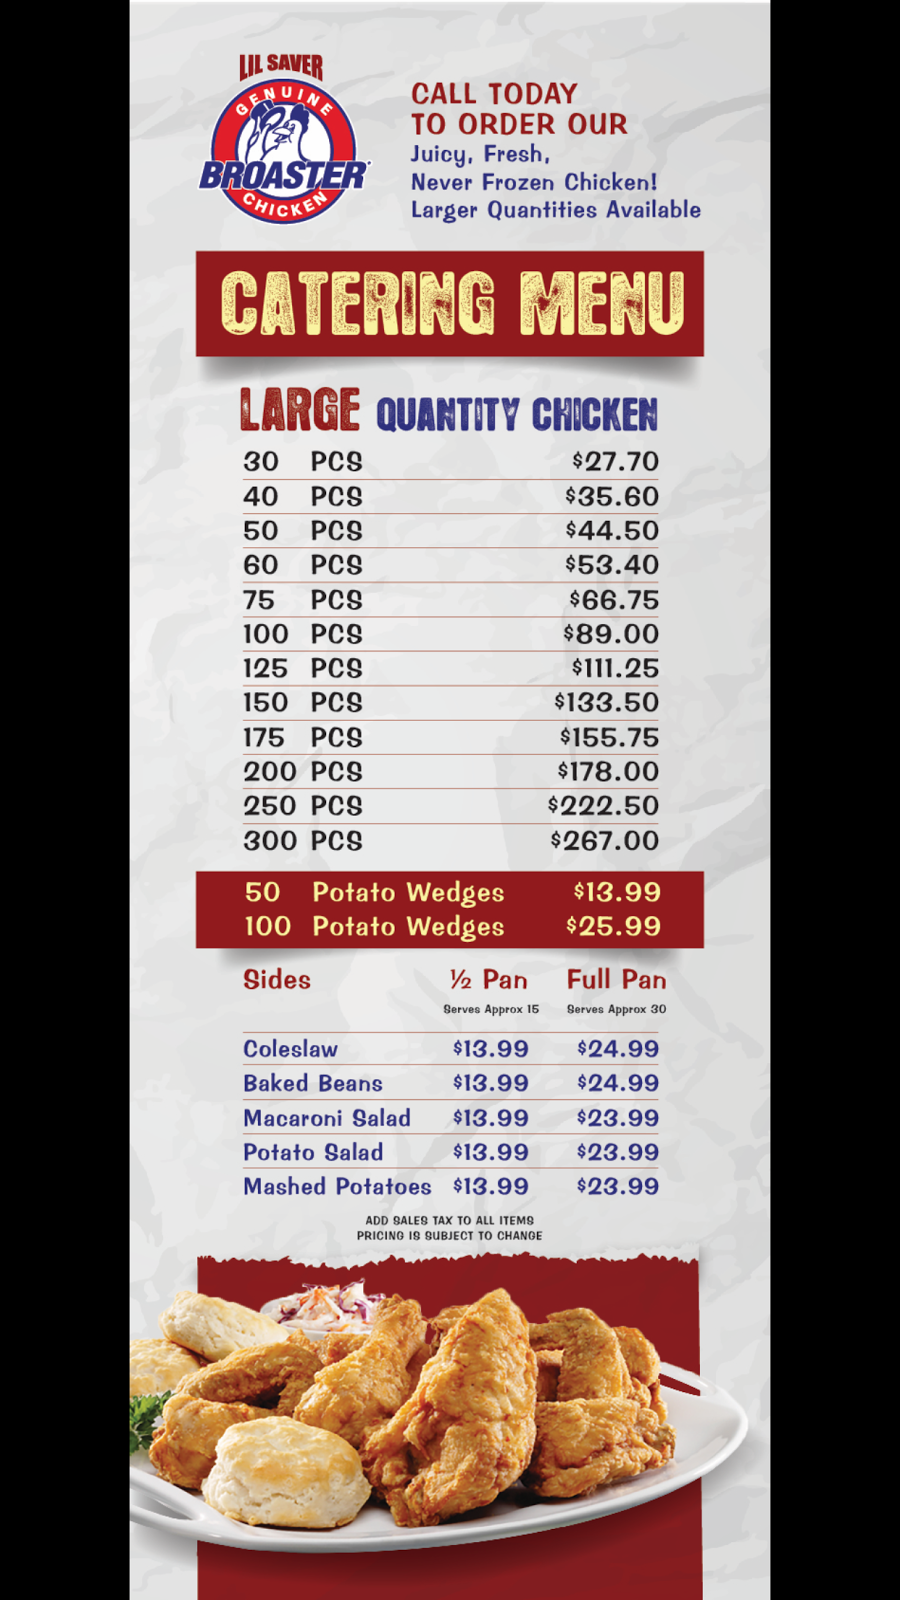 Lil Saver Broaster Chicken - gas station    Photo 8 of 10   Address: W, 393 US-6, Valparaiso, IN 46385, USA   Phone: (219) 763-2549